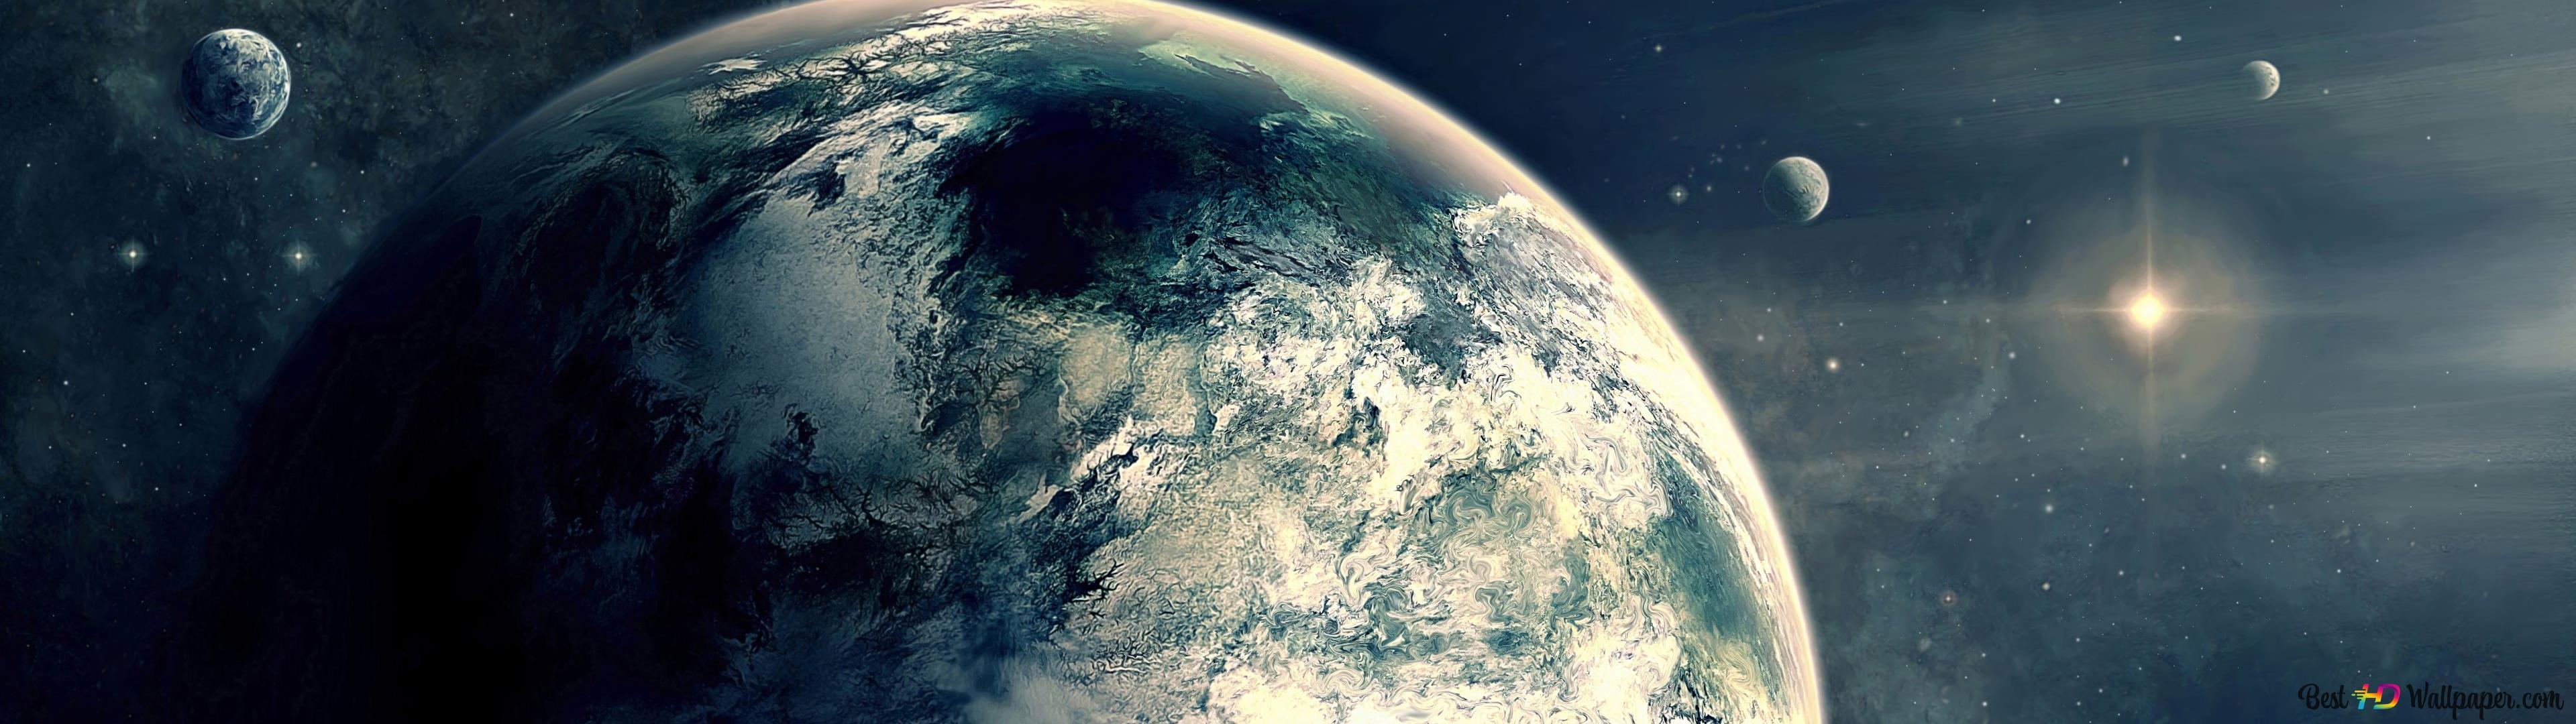 Planete Terre Galaxie Hiver Hd Fond D Ecran Telecharger